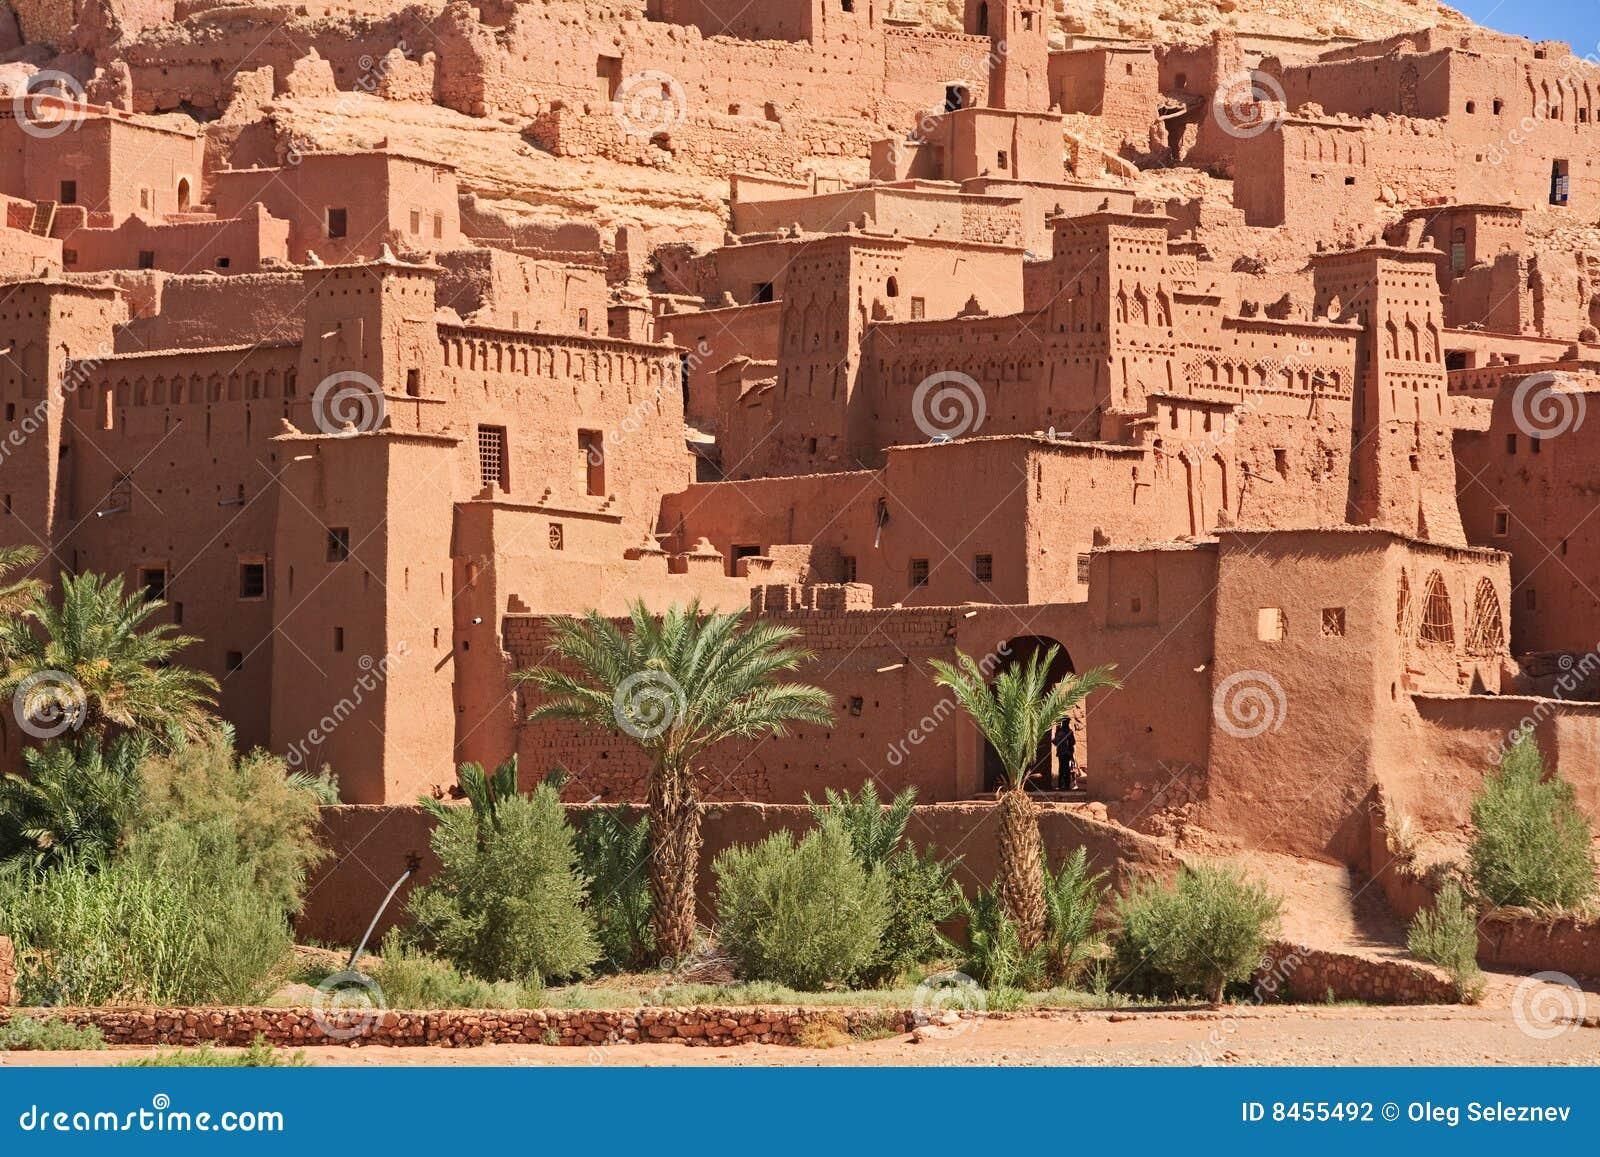 Ait benhaddou casbah Morocco